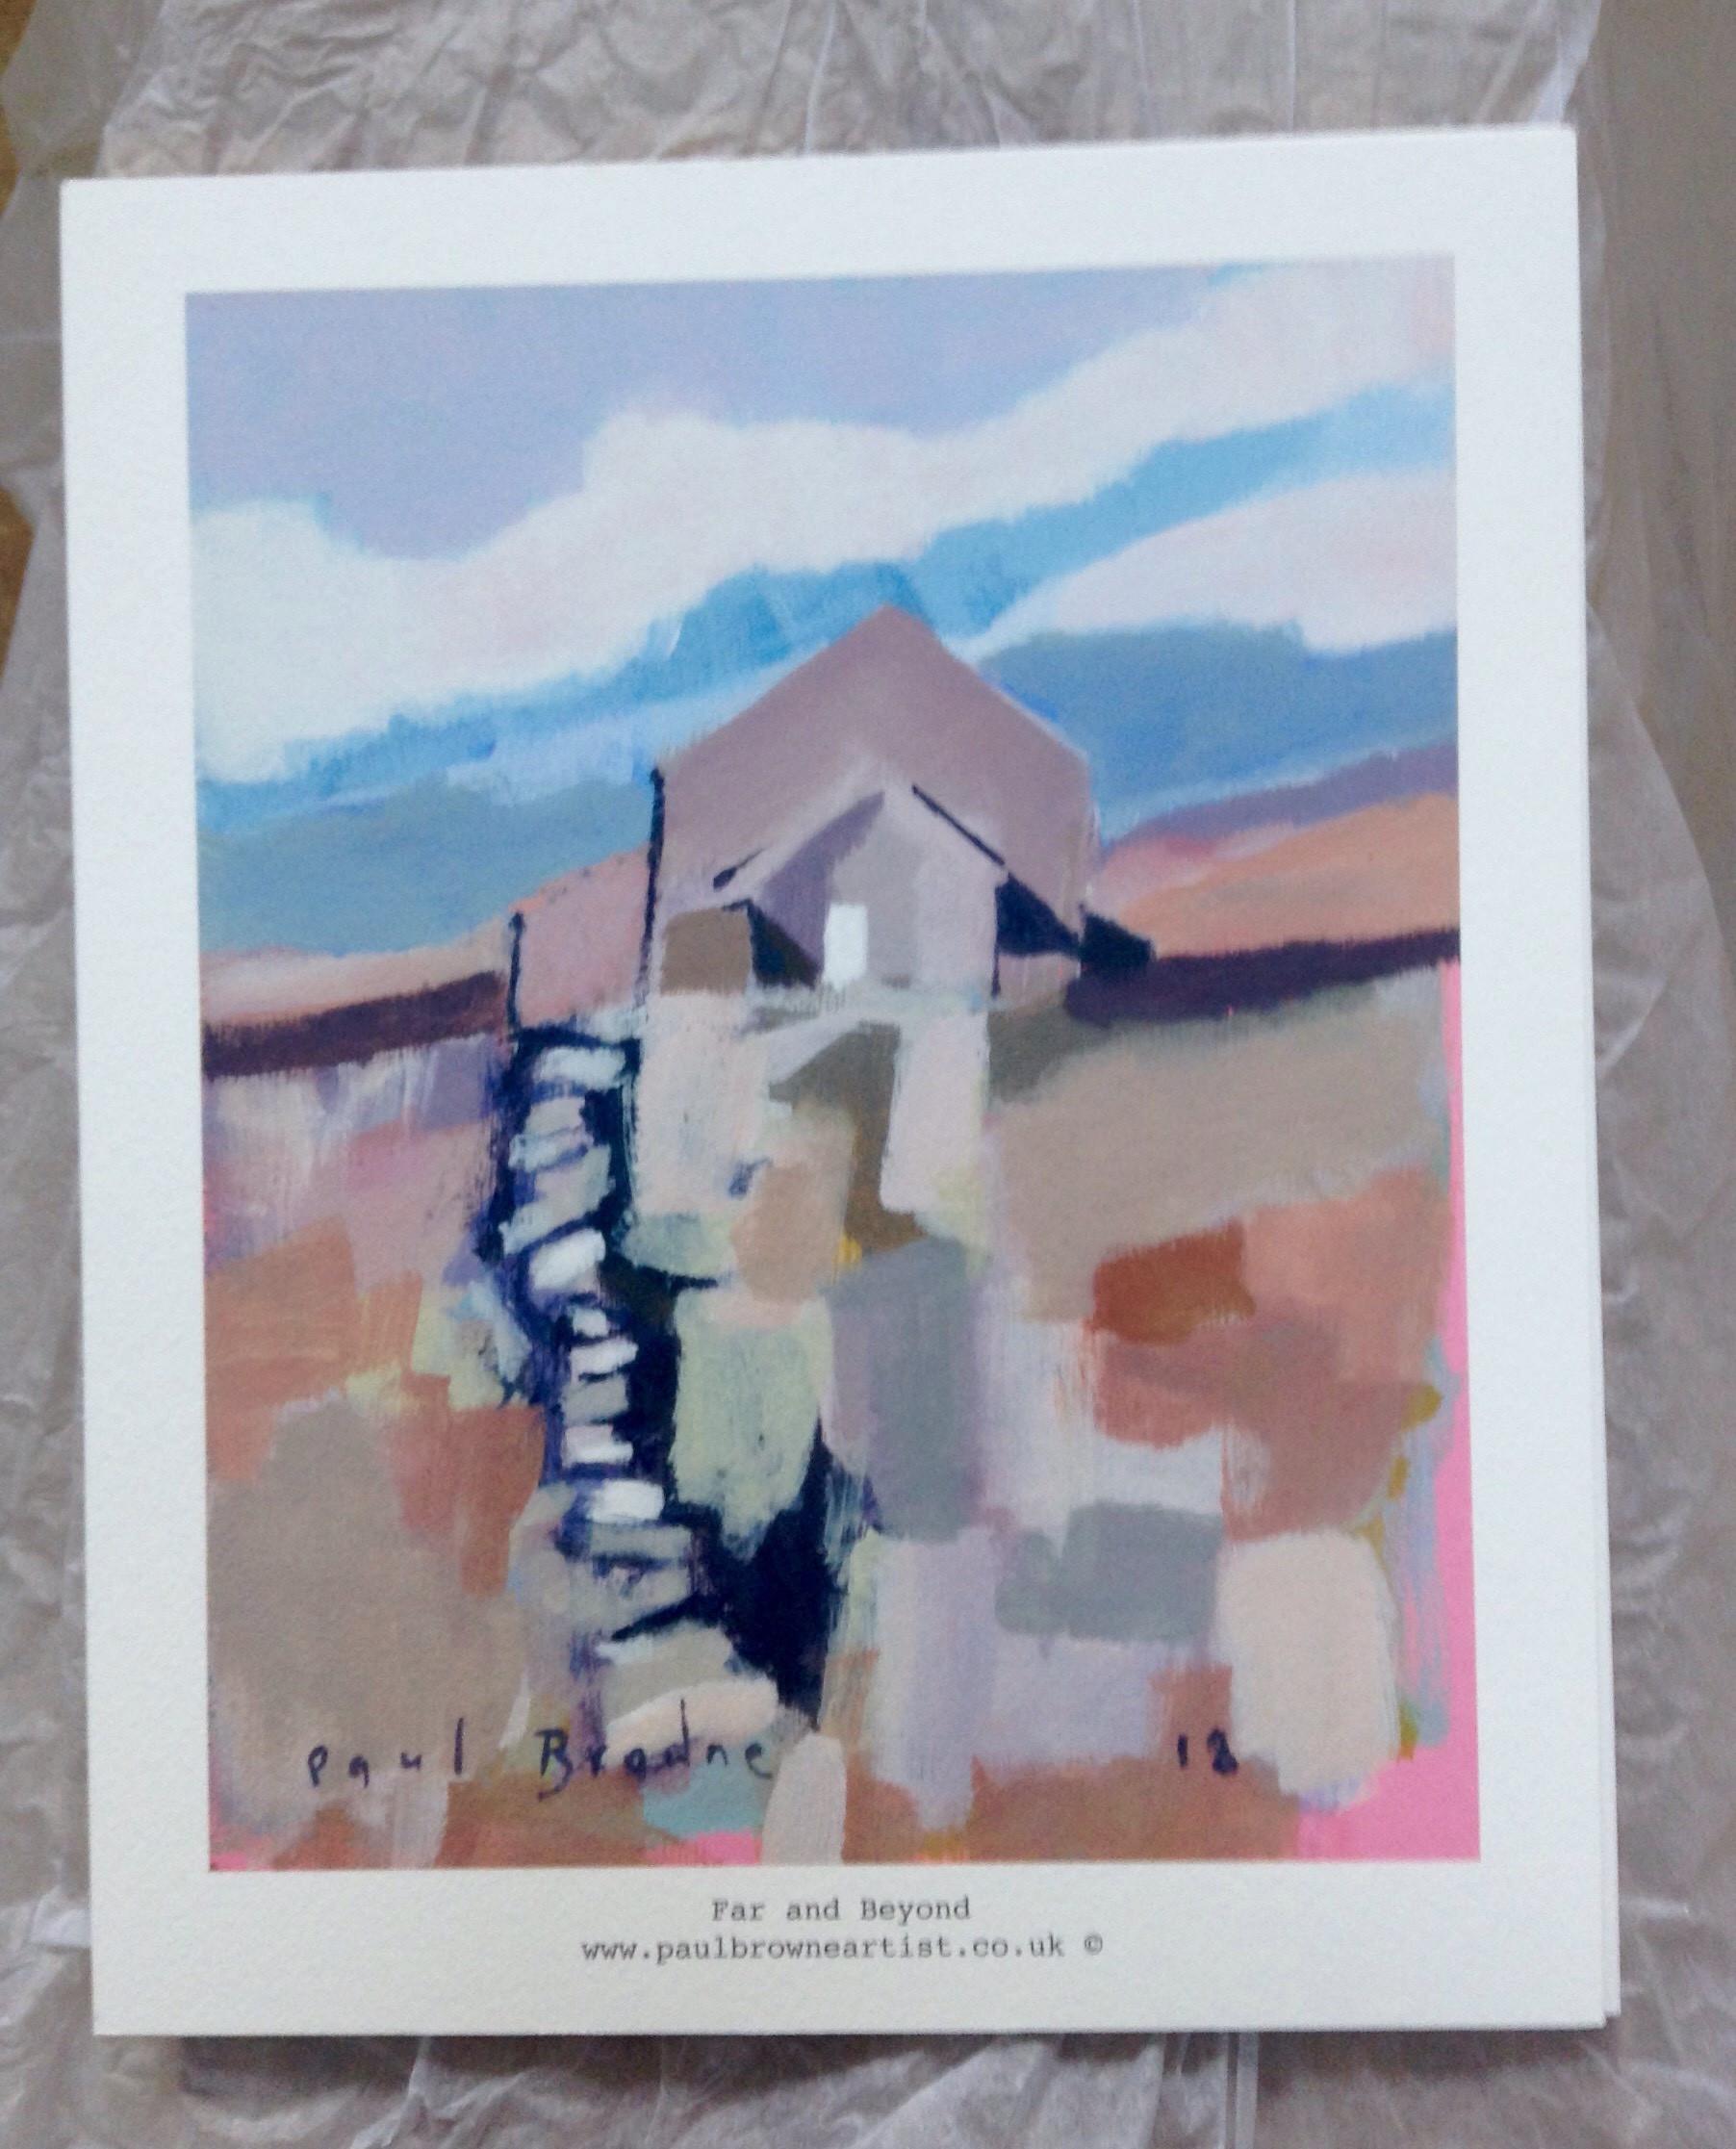 high quality giclee print | far & beyond | £60 | 30cm x 24cm